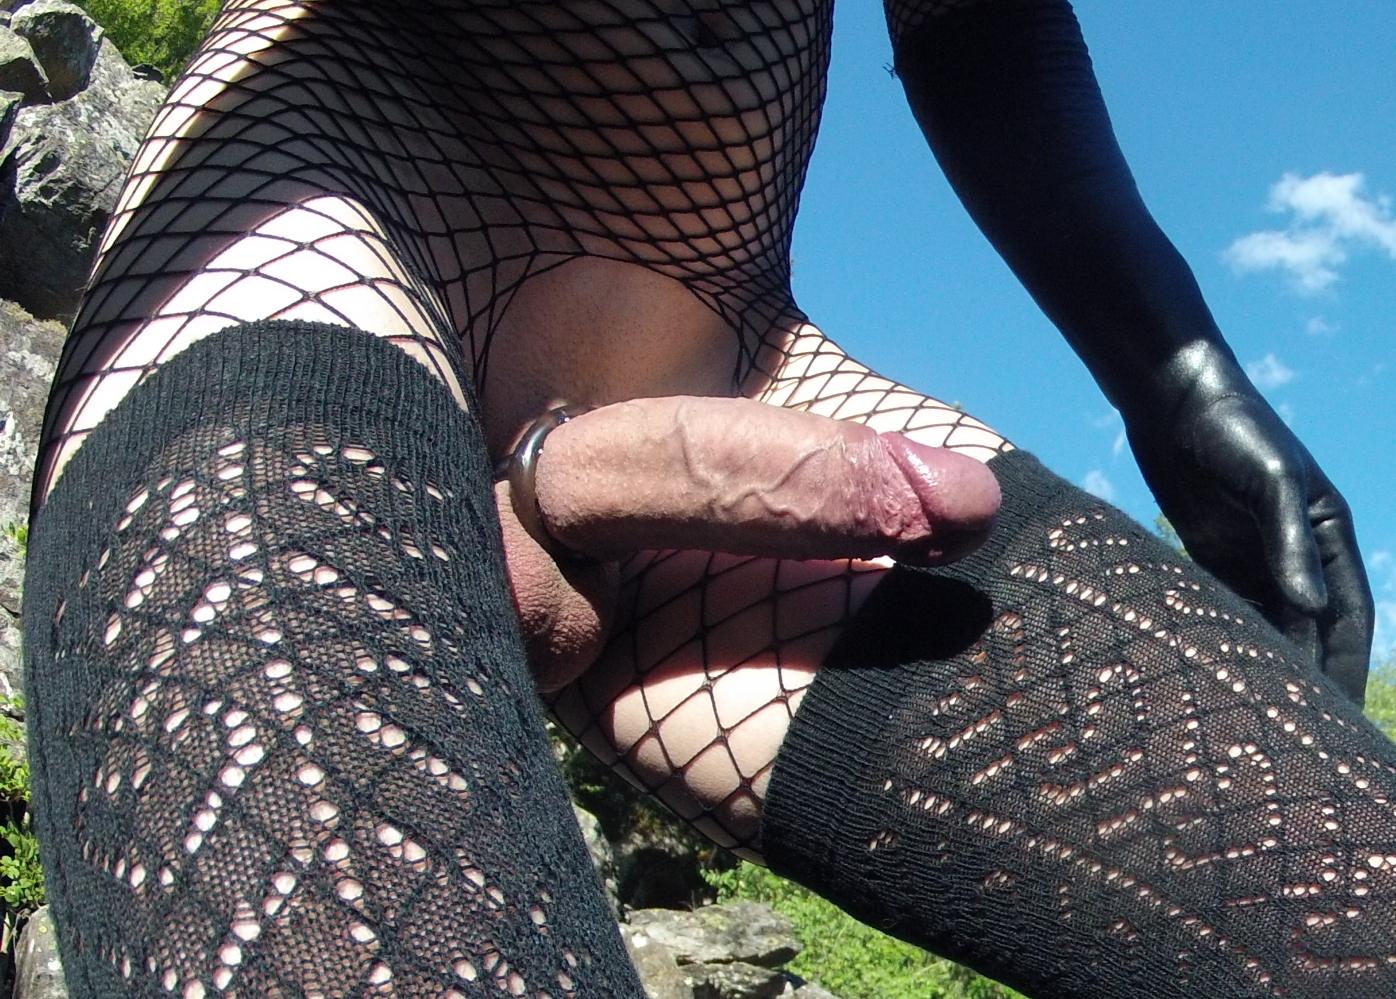 bianca varotti anal brazil mobile porno videos #amateur #cd #chickswithdicks #crossdress #femboi #gurl #iwantthatstiffcockballsdeepinmyass #iwanttosuckhercock #niceknob #shecock #sissy #sissyboy #sissycock #tgirl #tgirl #trannycock #trans #traps #tv